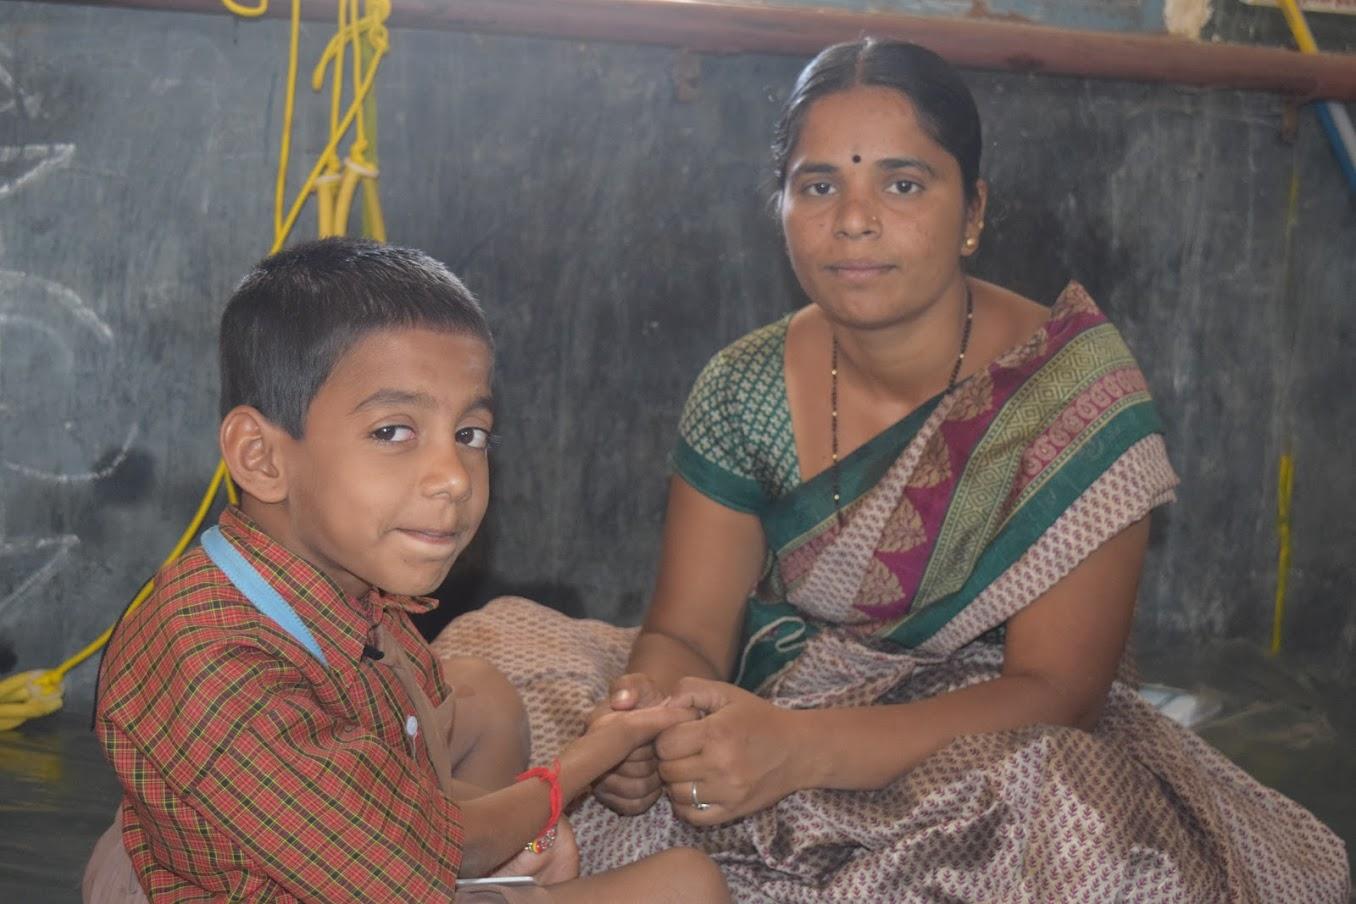 image of kid